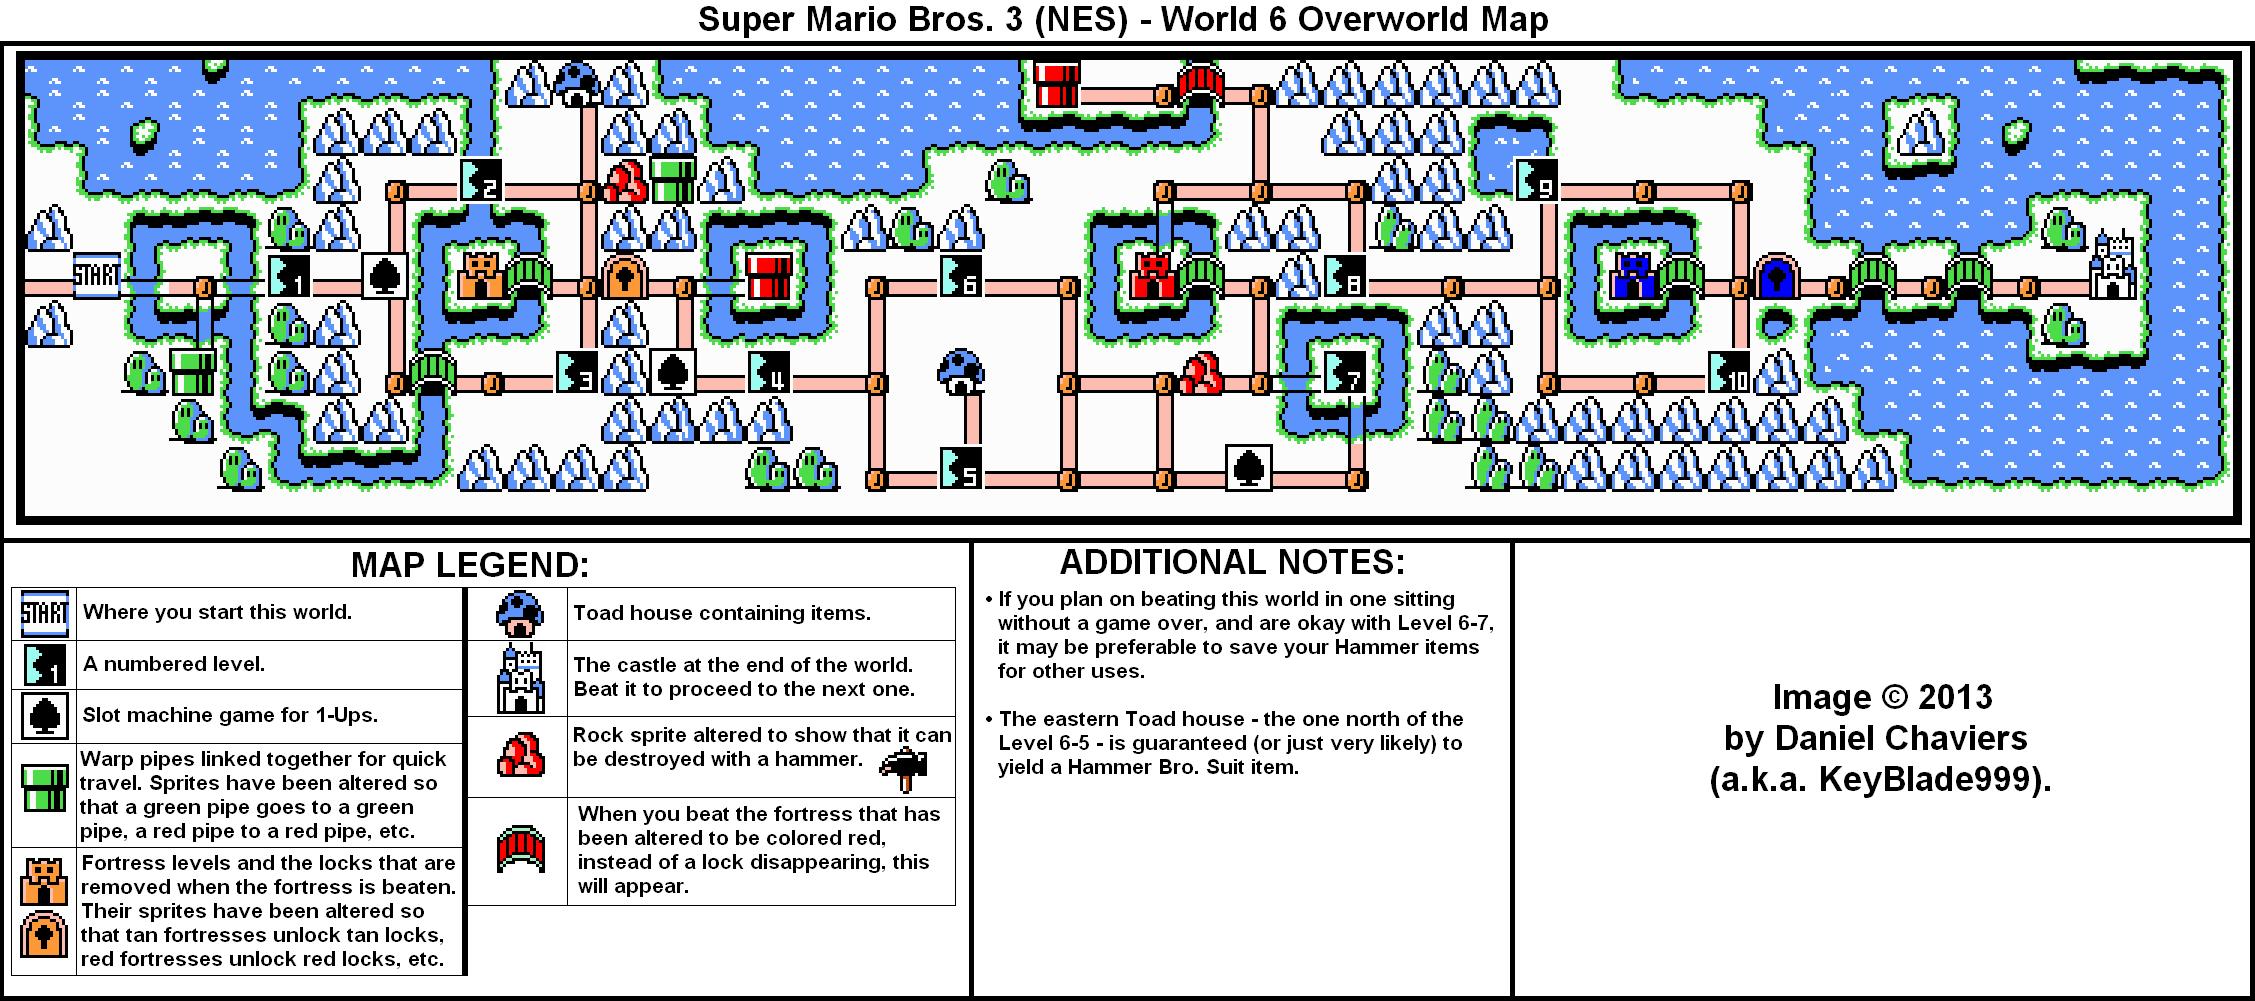 Mario 3 World Map.Super Mario Bros 3 World 6 Overworld Map Png Neoseeker Walkthroughs